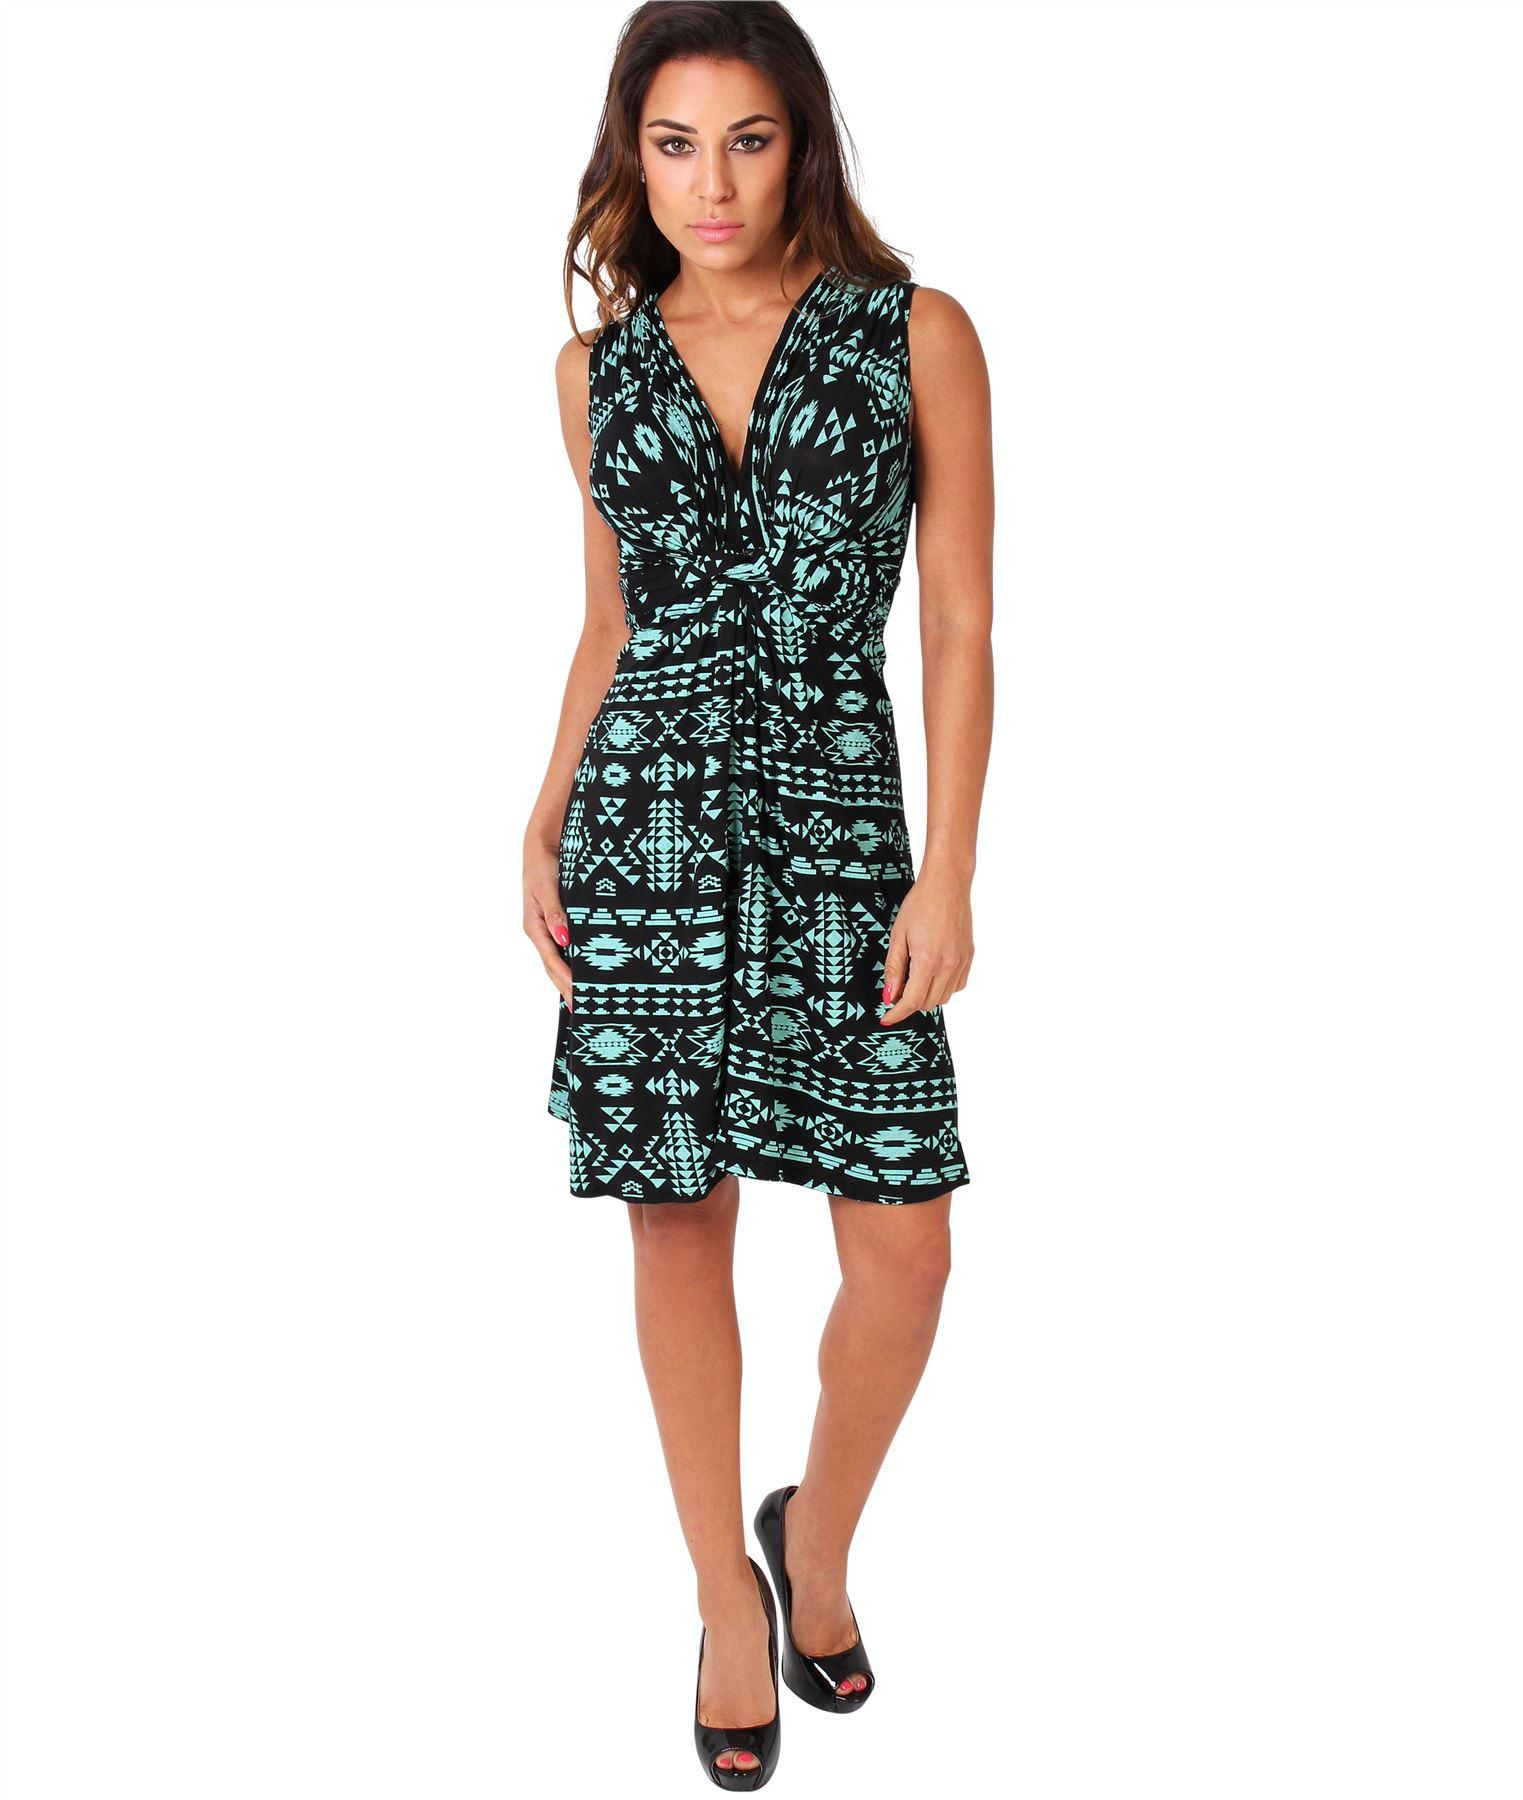 Womens-V-Neck-Mini-Dress-Small-Sizes-Short-Skirt-Tribal-Print-Front-Knot-Party thumbnail 21